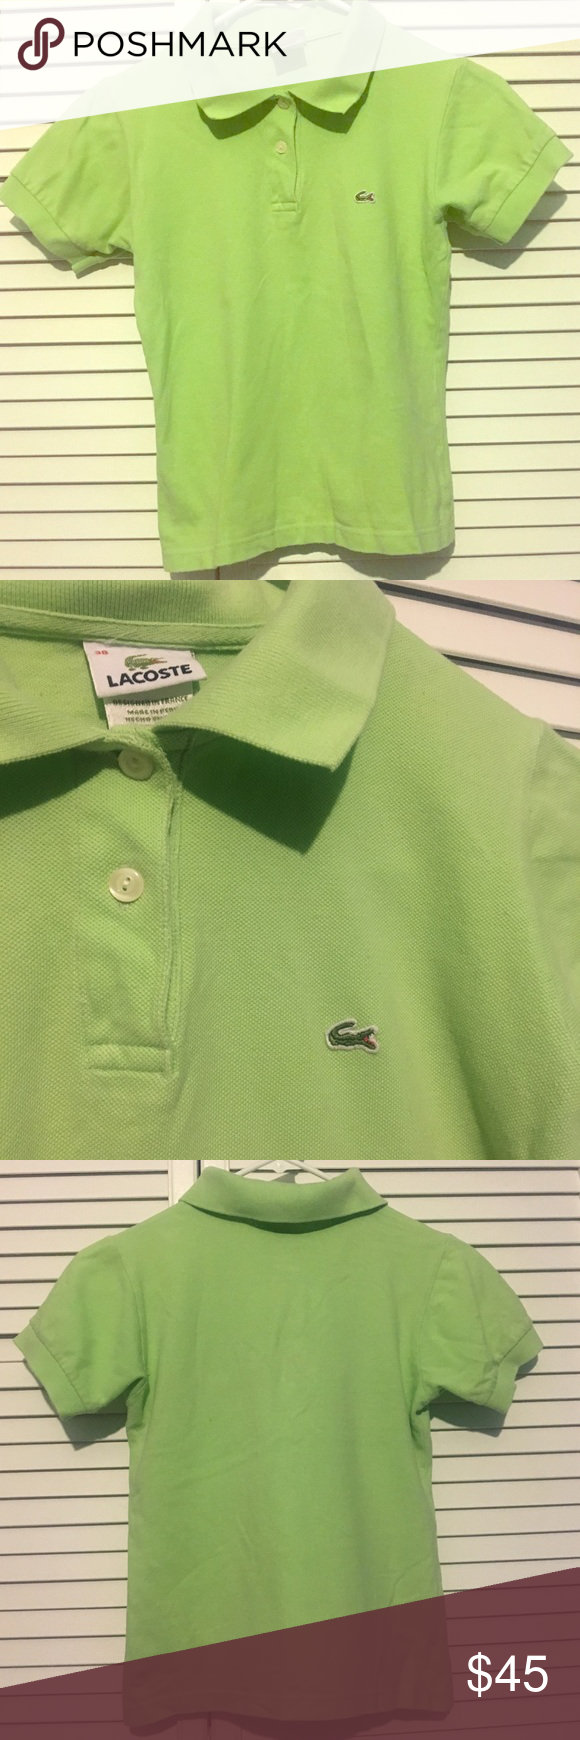 Girl Junior Shirt Lacoste Junior Shirts Green Polo Shirts Lacoste